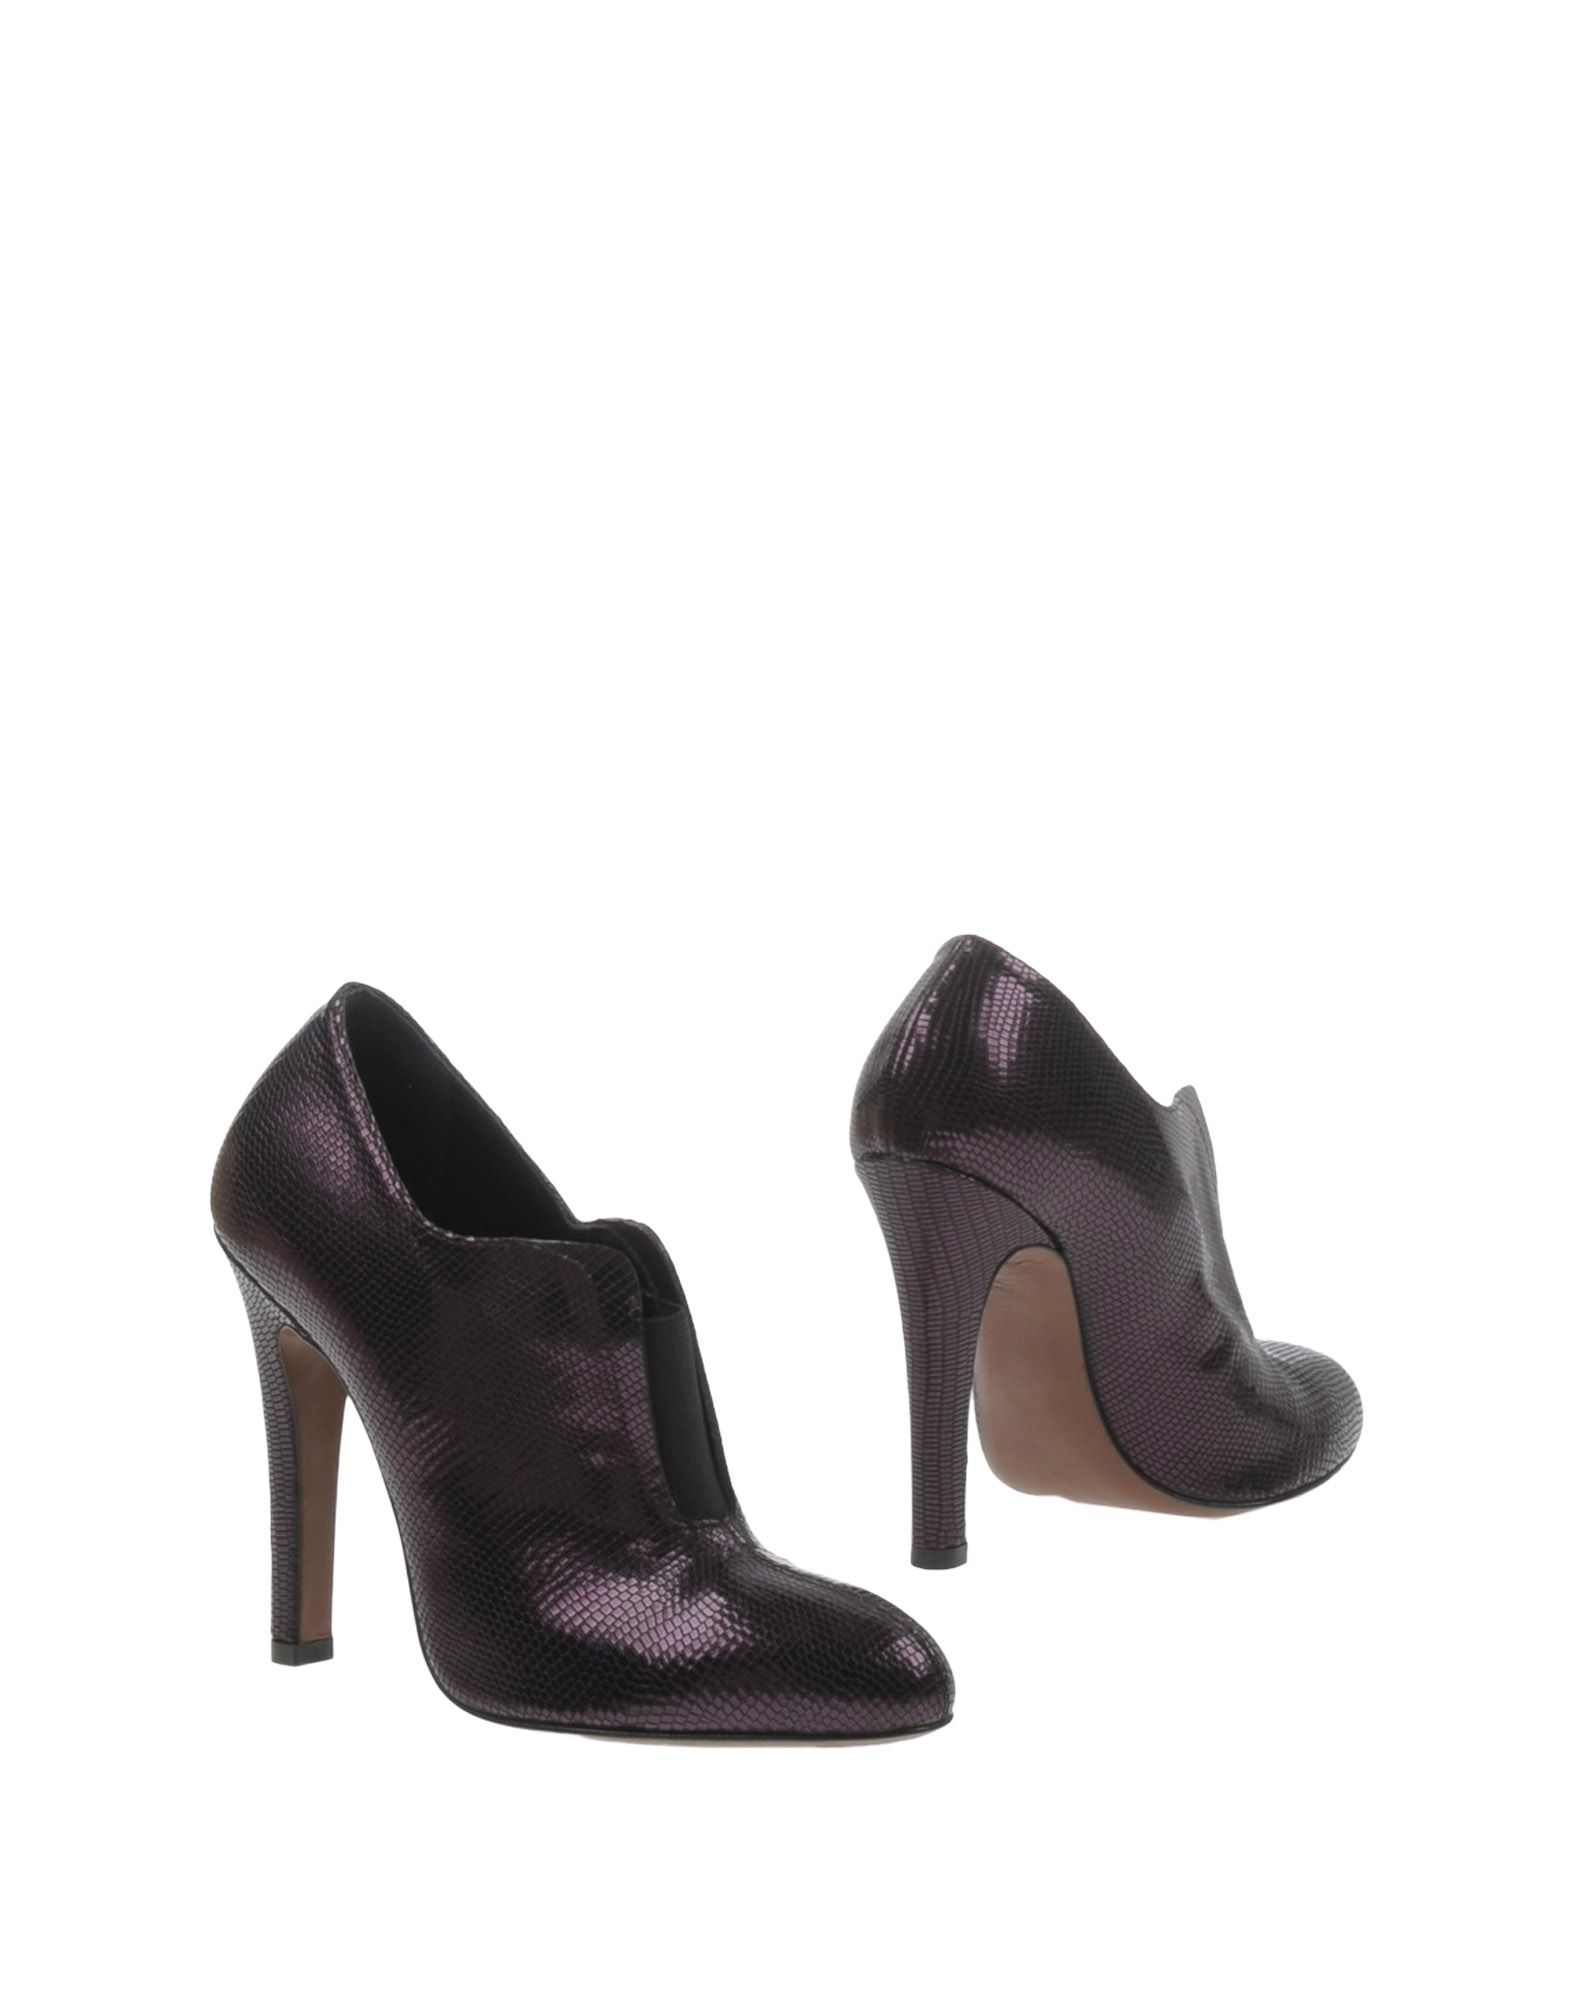 Kallistè Stiefelette  Damen  Stiefelette 11371131LT Gute Qualität beliebte Schuhe df6a00